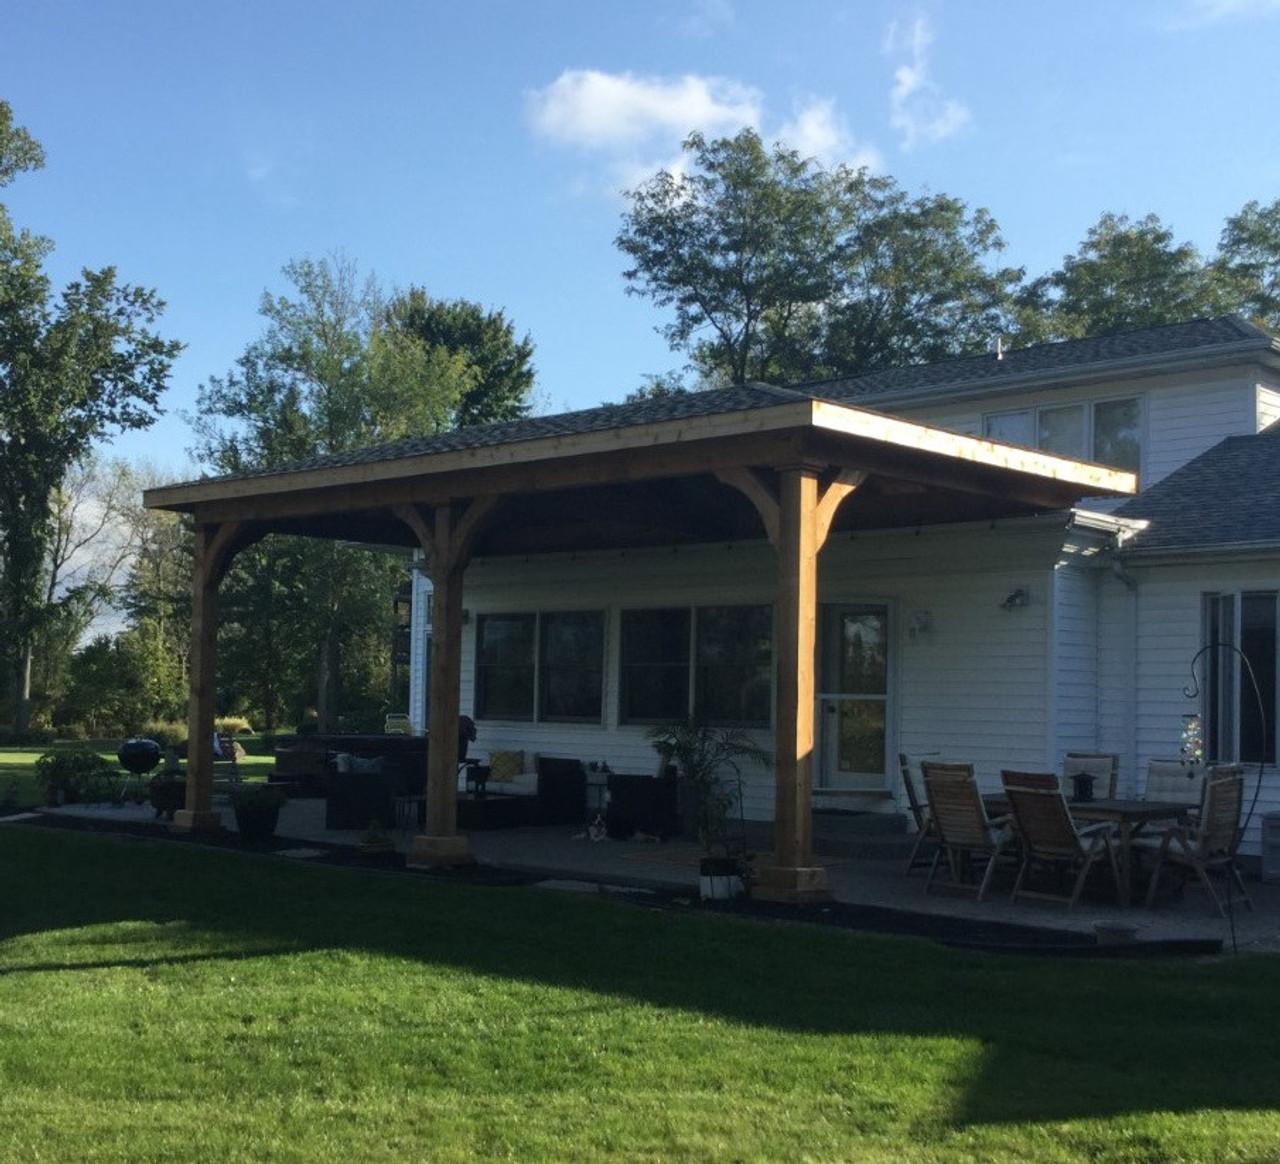 14x28 Grand Cedar Pavilion Kit, Lockport, New York